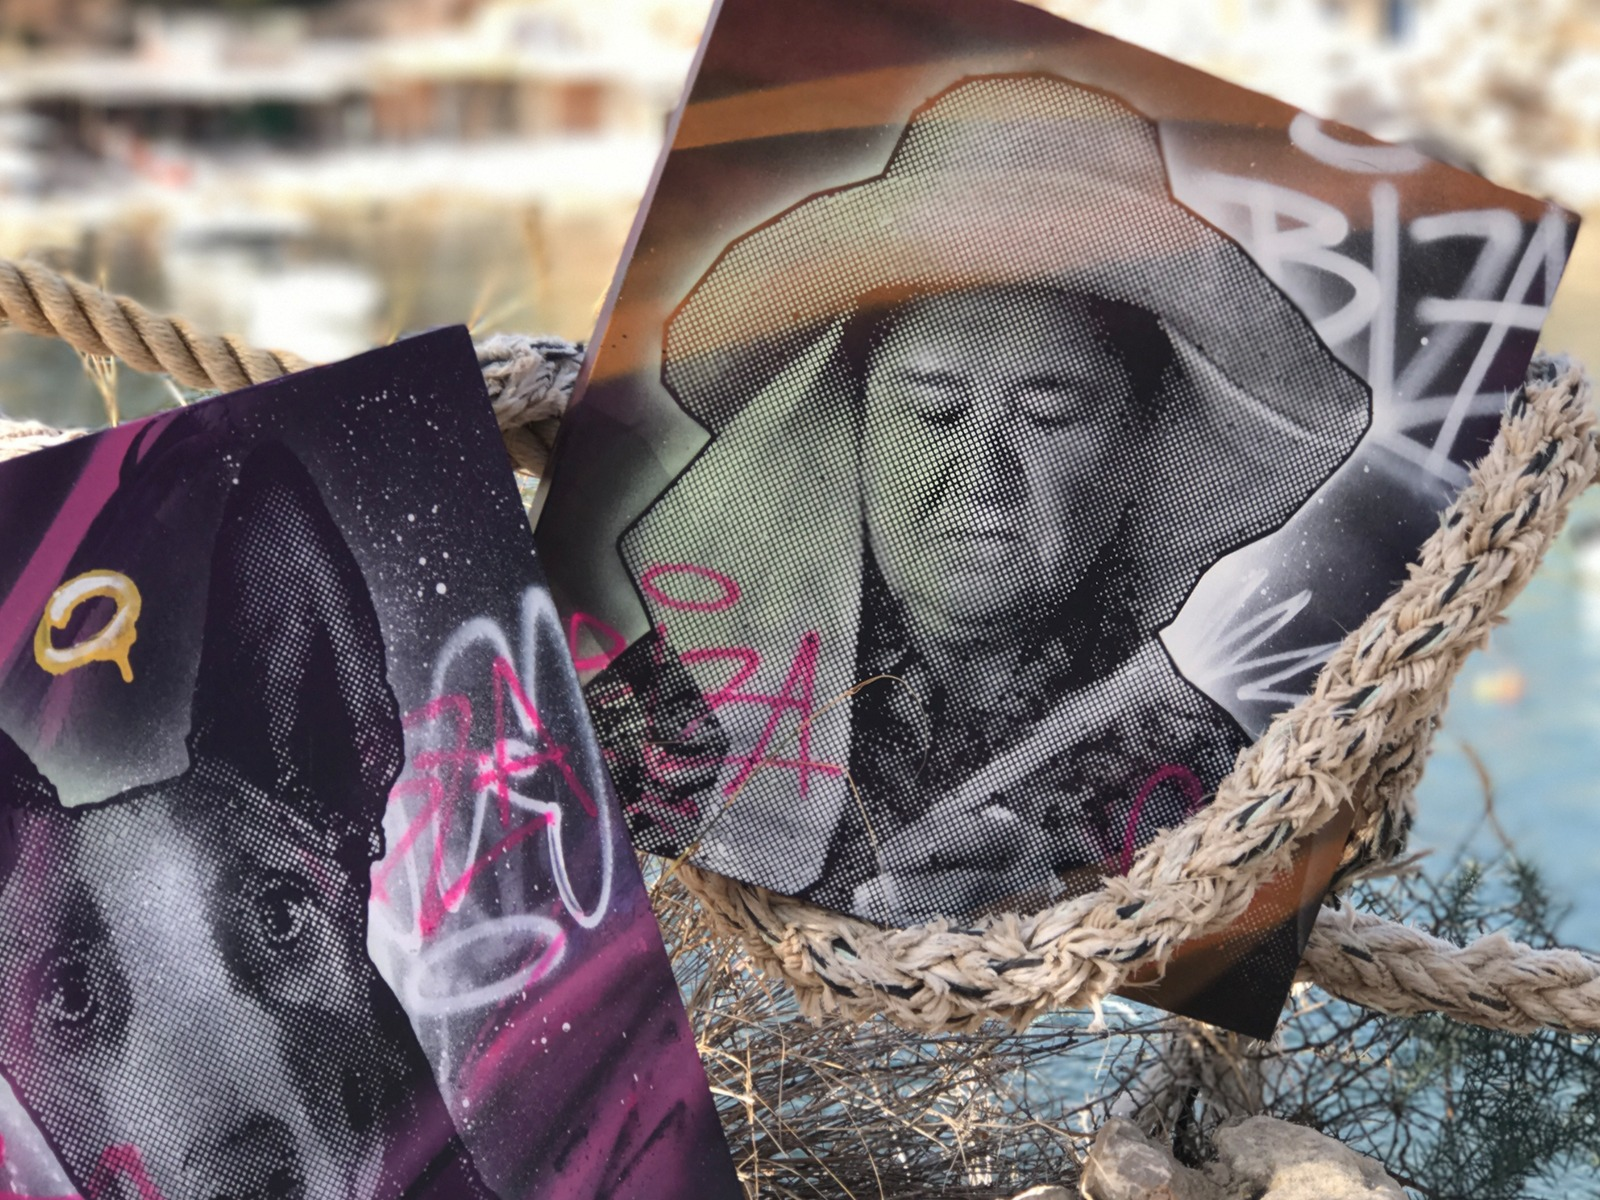 graffitiauftrag-graffitikuenstler-artmos4-graffiti-artist-ibiza-bfree-canvas-traditional